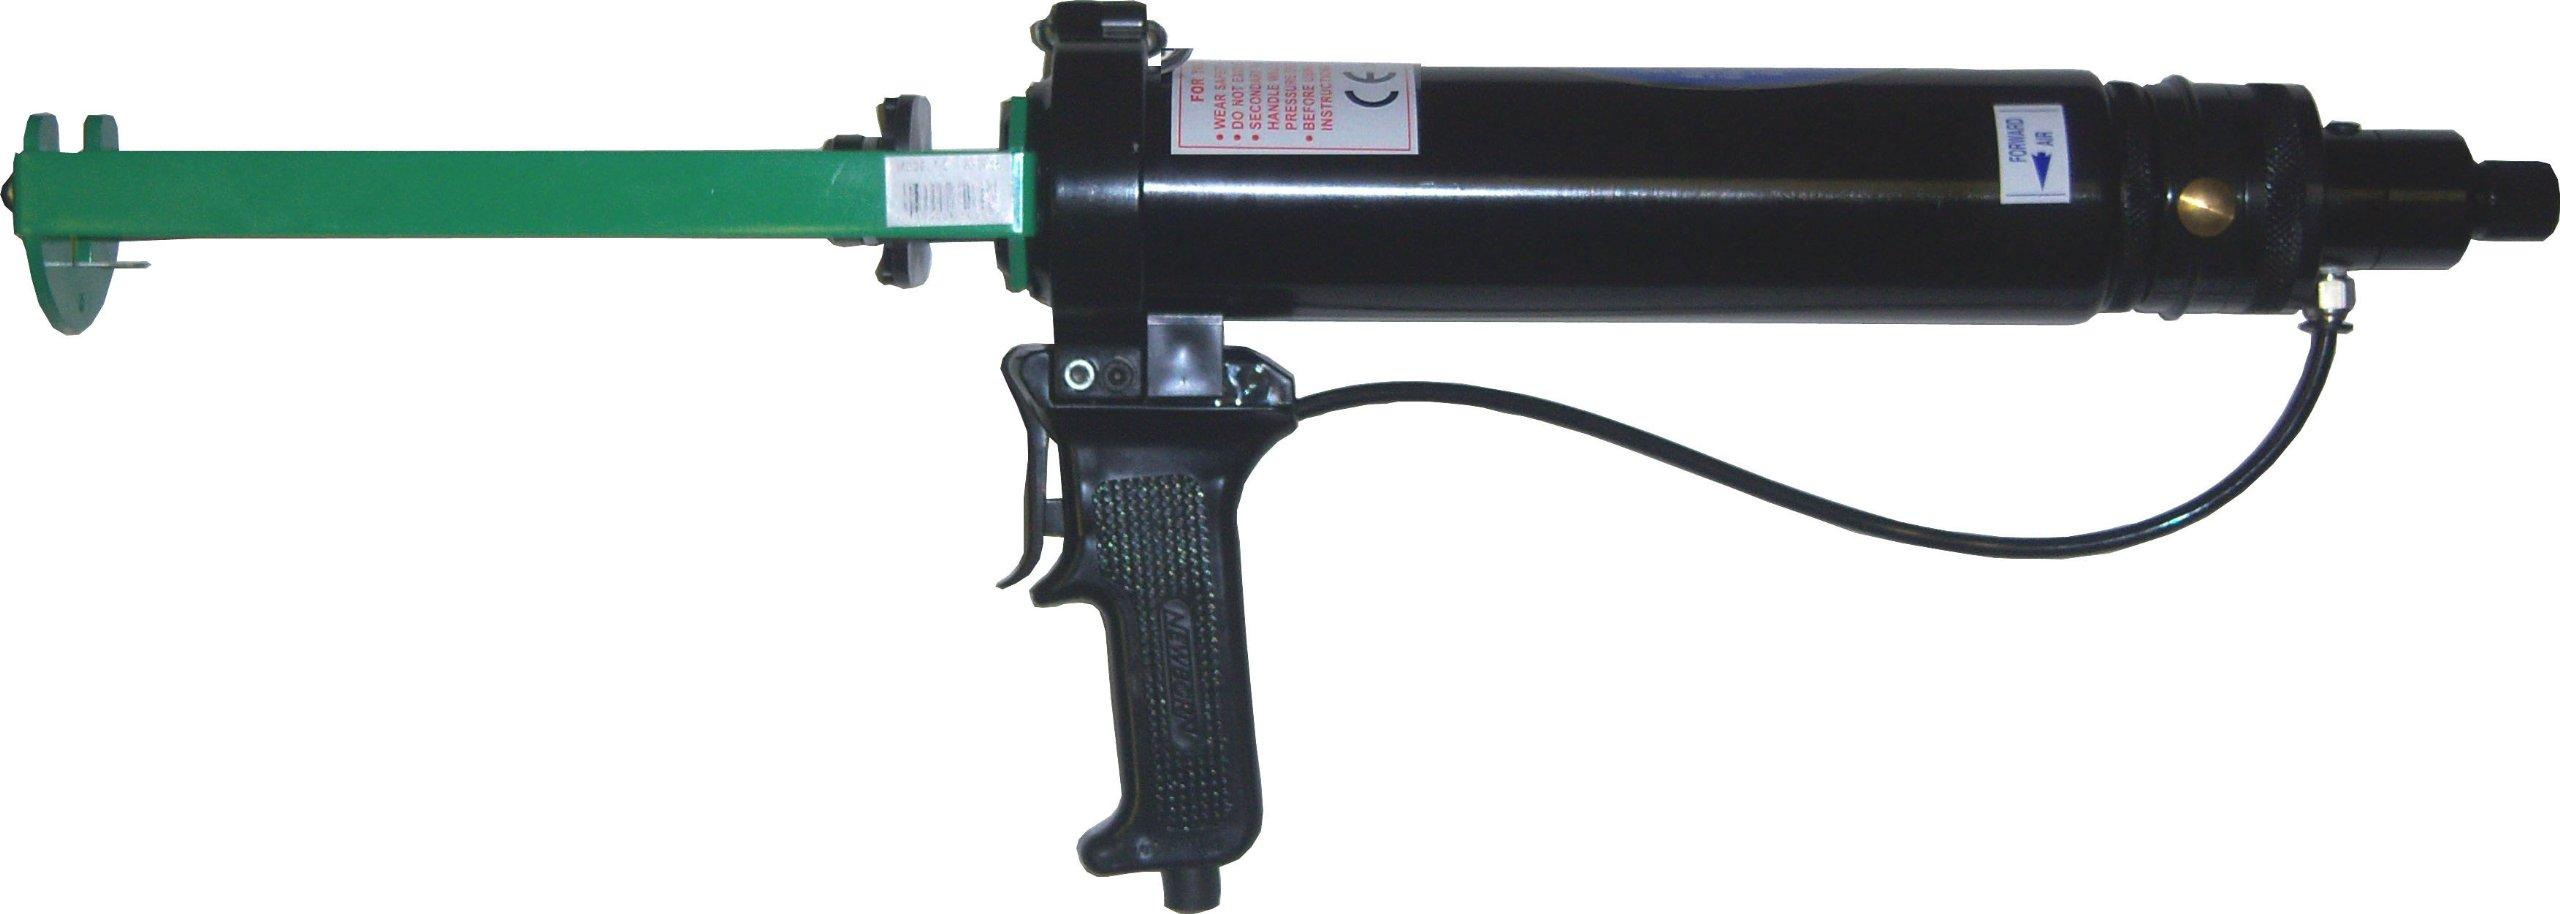 Newborn 830A15 Dual-Component Pneumatic Applicator, 2-1/2'' Cylinder, for 150 mL x 150 mL Cartridges, 100 psi